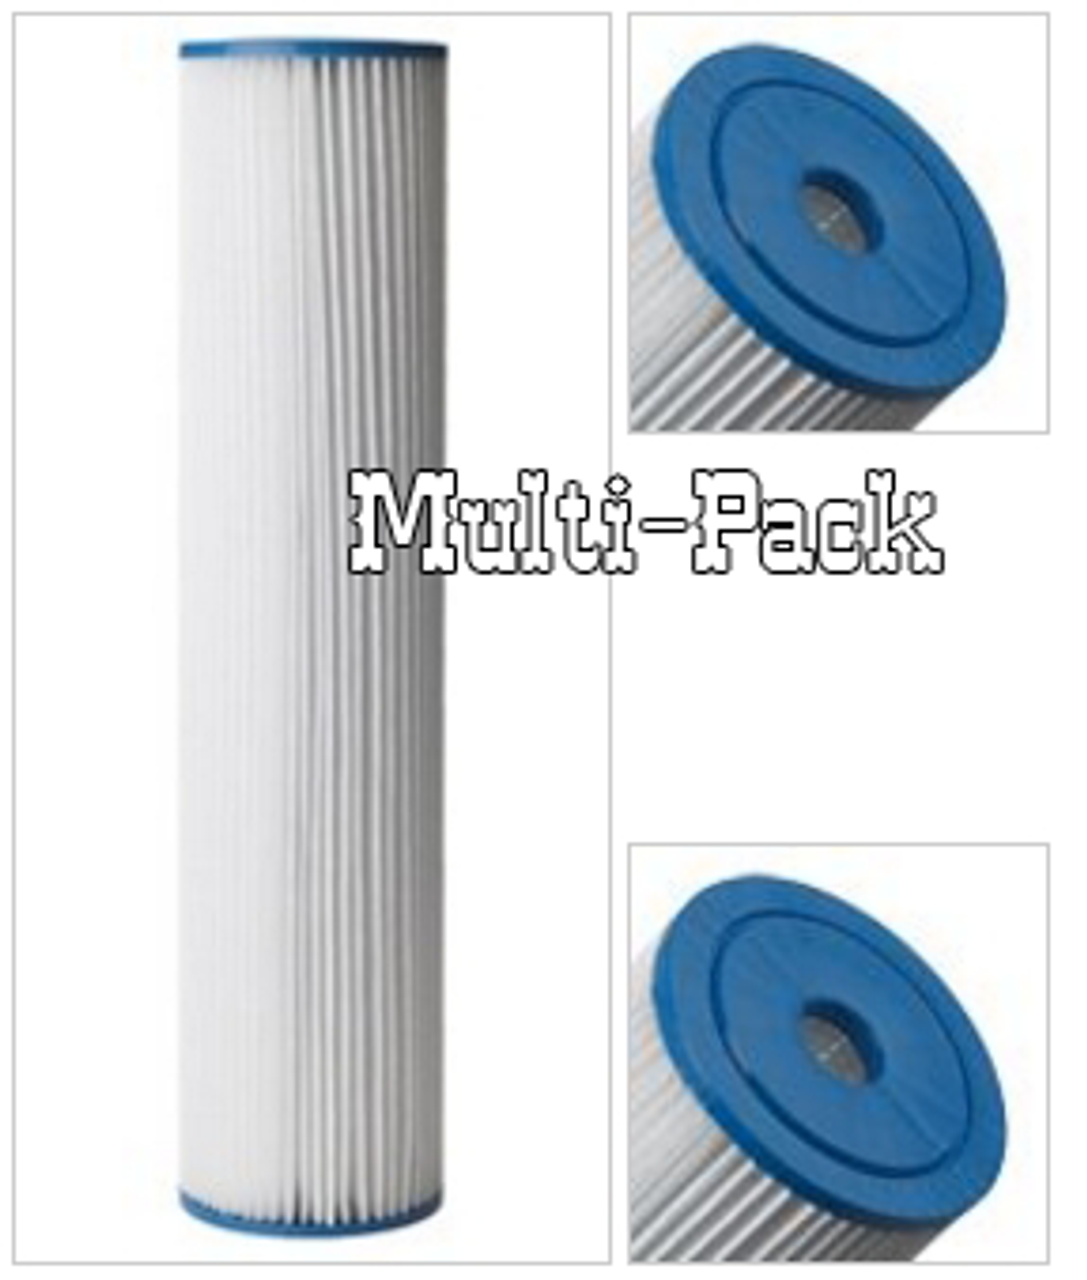 LIFEGUARD Pleatco Filter Cartridge PH6 FC-2310 C-2604